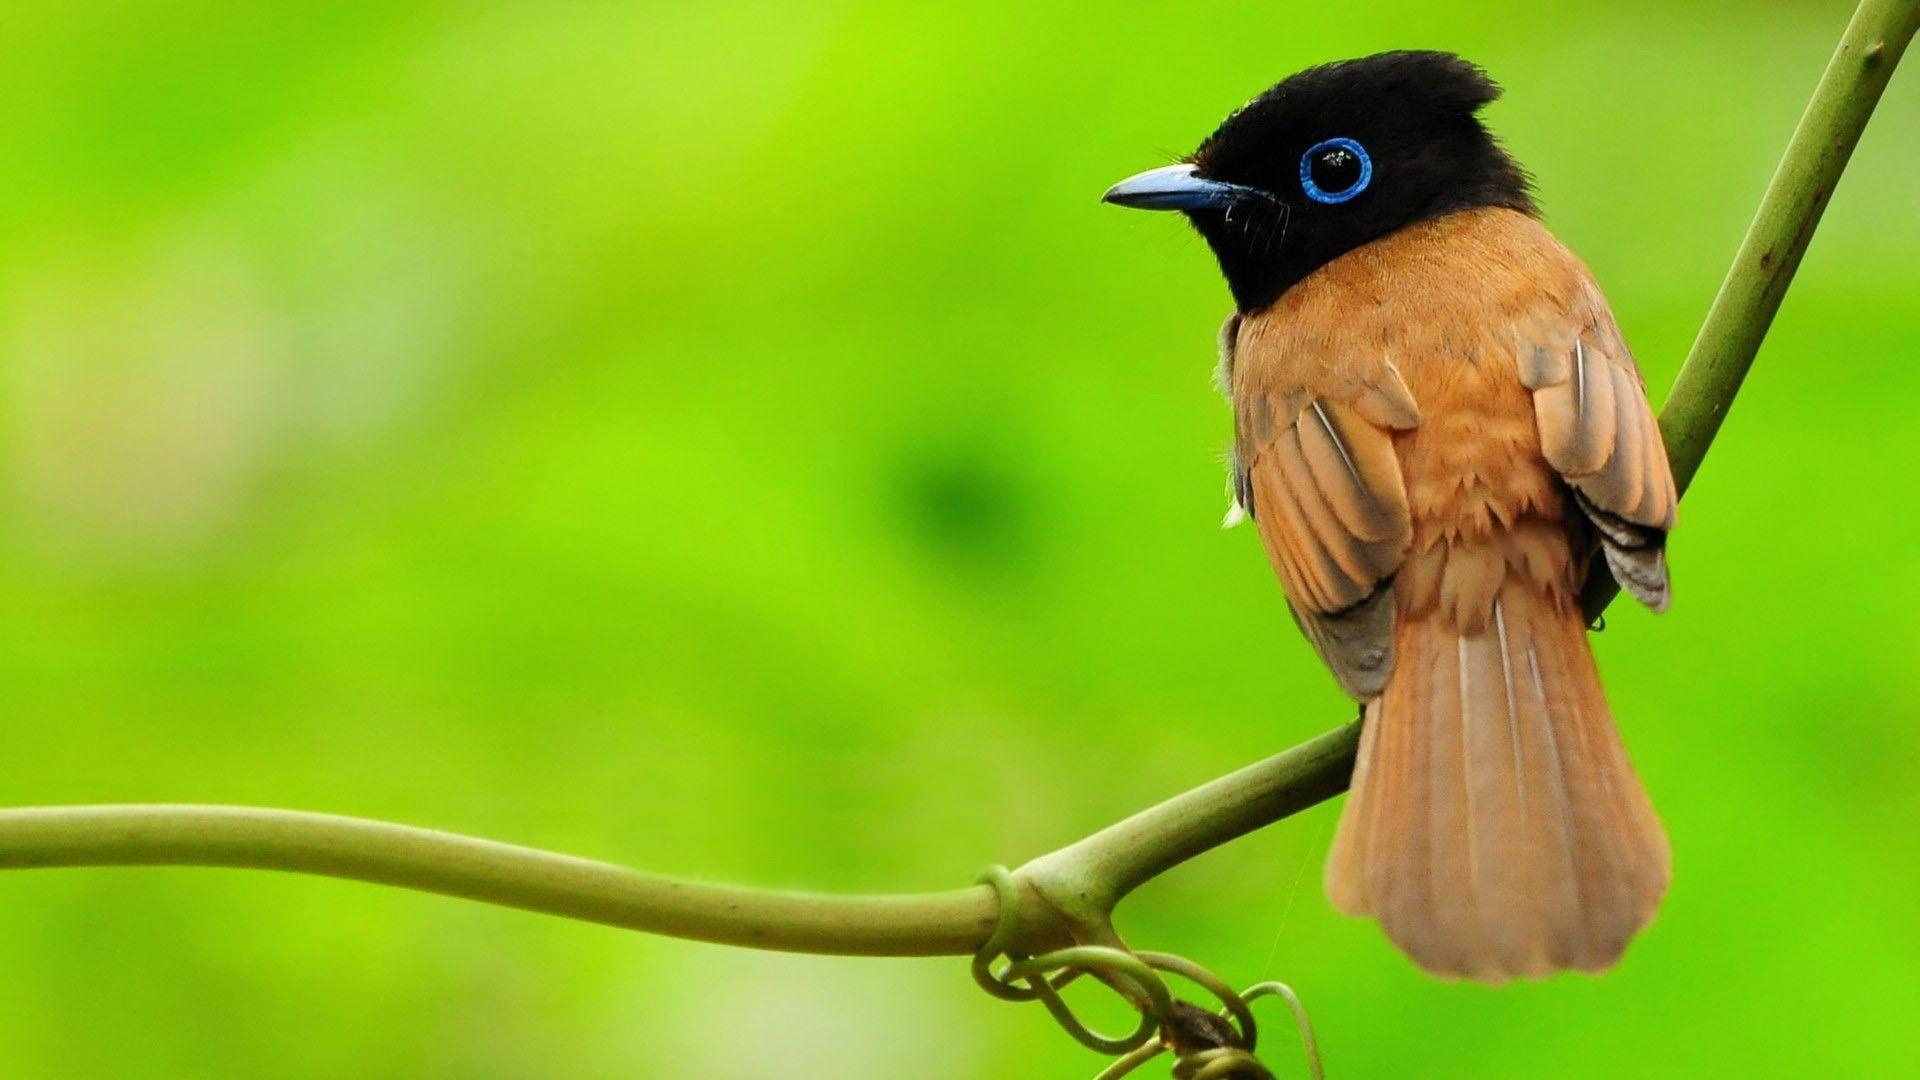 Pin By Lauri Oberlander On Animalia Beautiful Birds Pretty Birds Colorful Birds